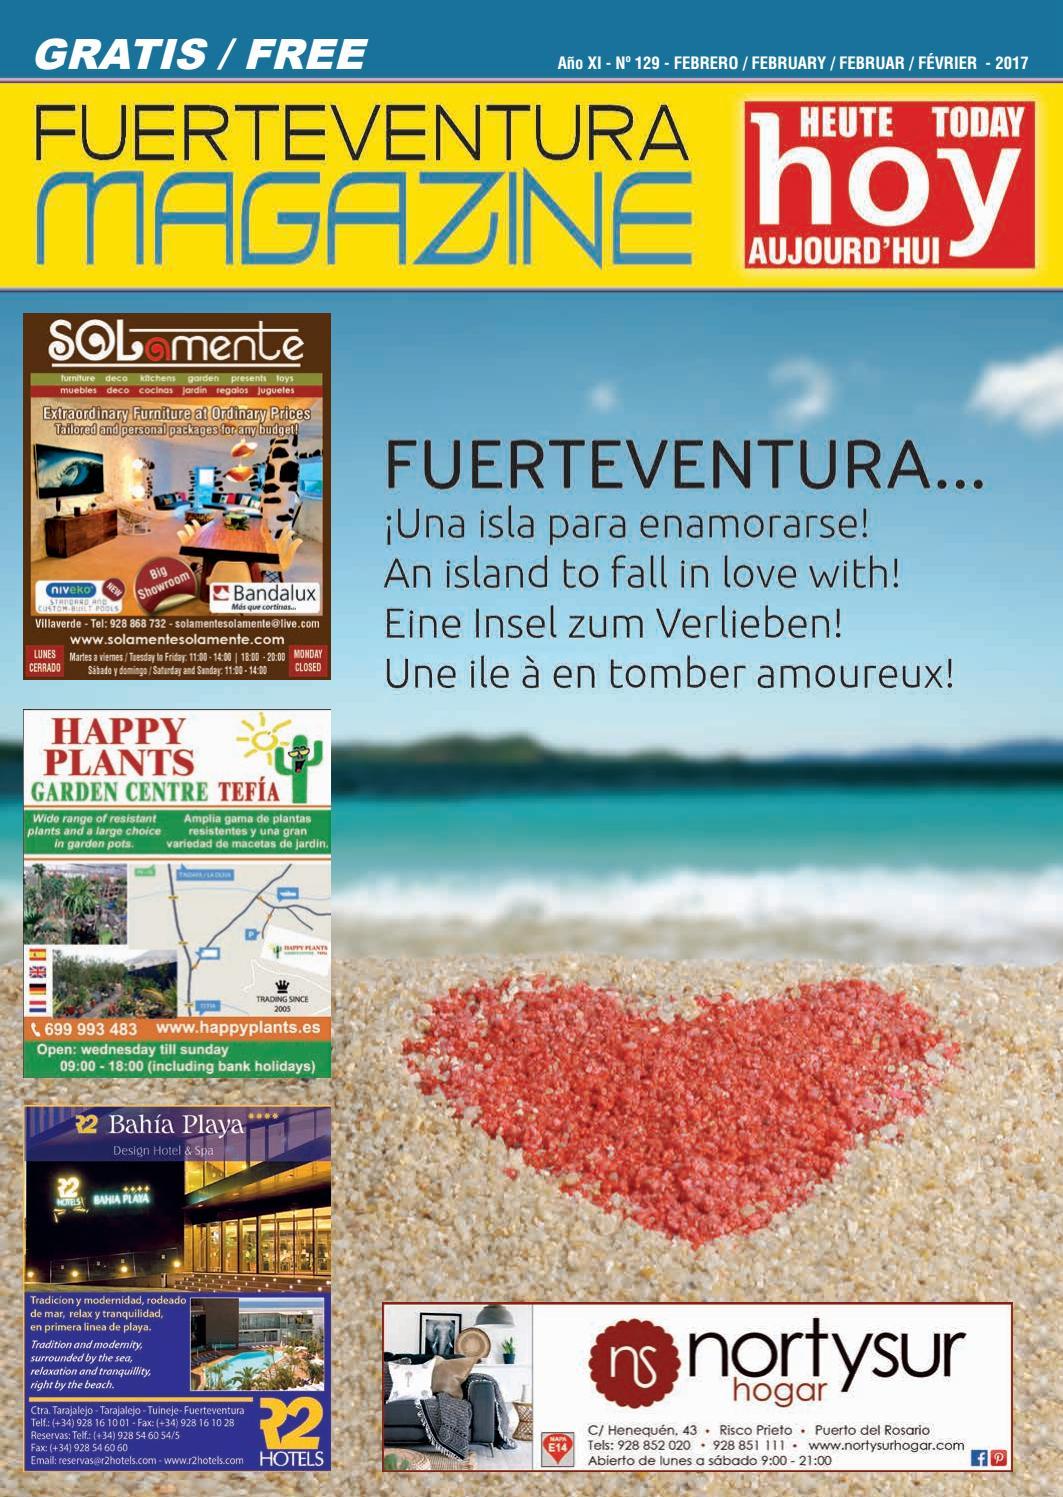 jacuzzi exterior 60 dise os que te encantar n este 2017 estreno 11 FUERTEVENTURA MAGAZINE HOY - Nº 129 - FEBRERO 2017 by Fuerteventura  Magazine Hoy - issuu